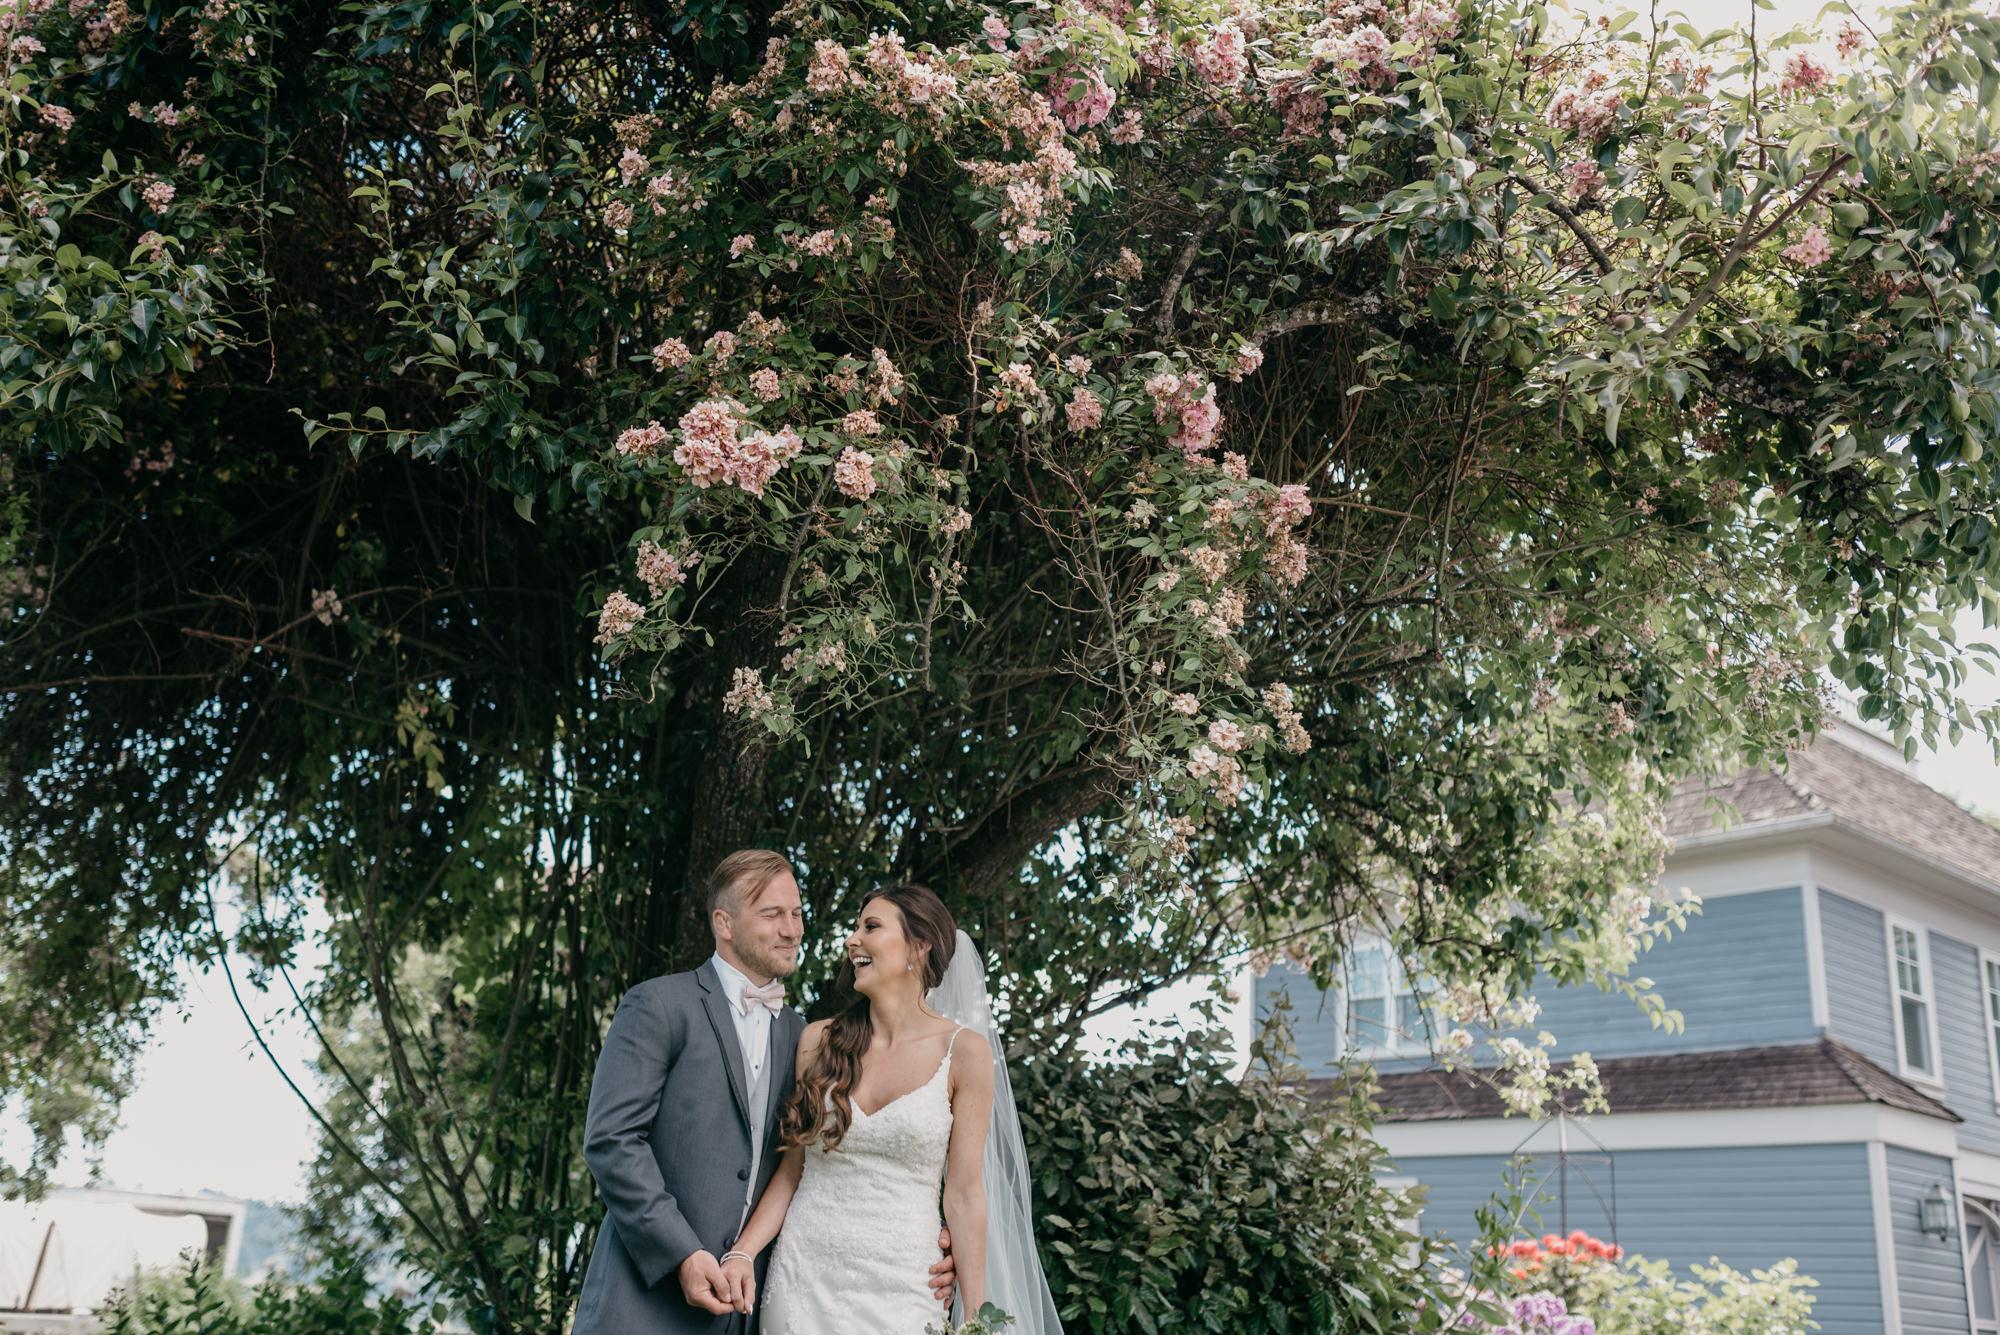 88-lake-oswego-wedding-portland-couple-rose-tree.jpg